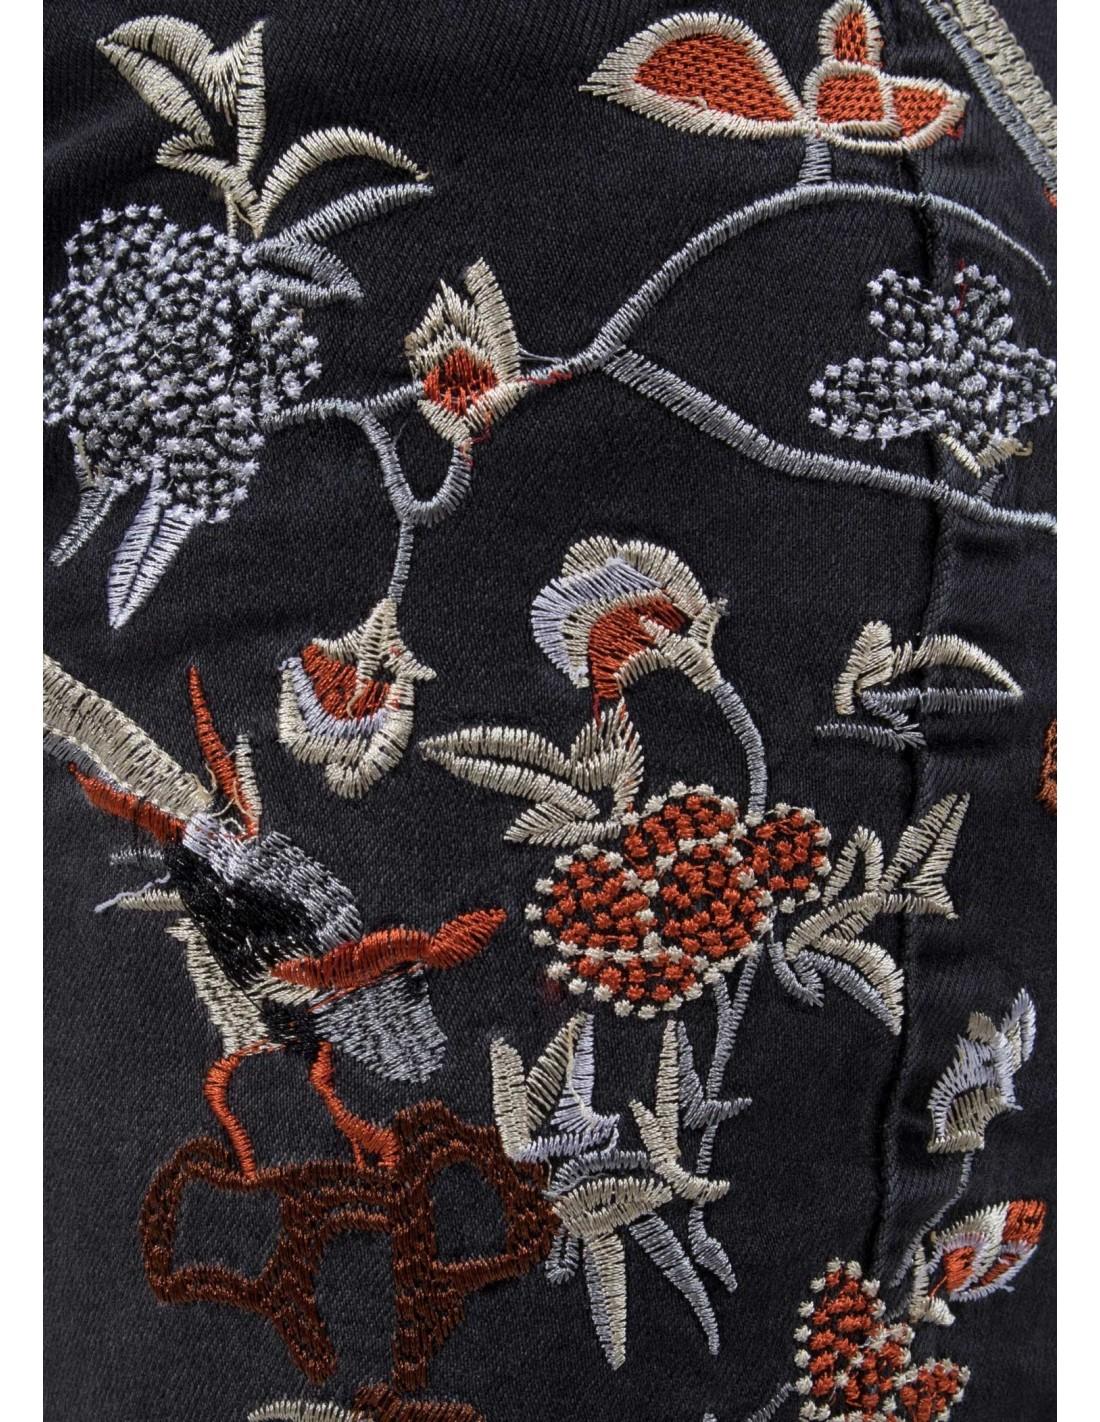 96ffbe5b795 jean-slim-noir-femme-taille-haute-avec-broderie-fleurs-oiseaux.jpg